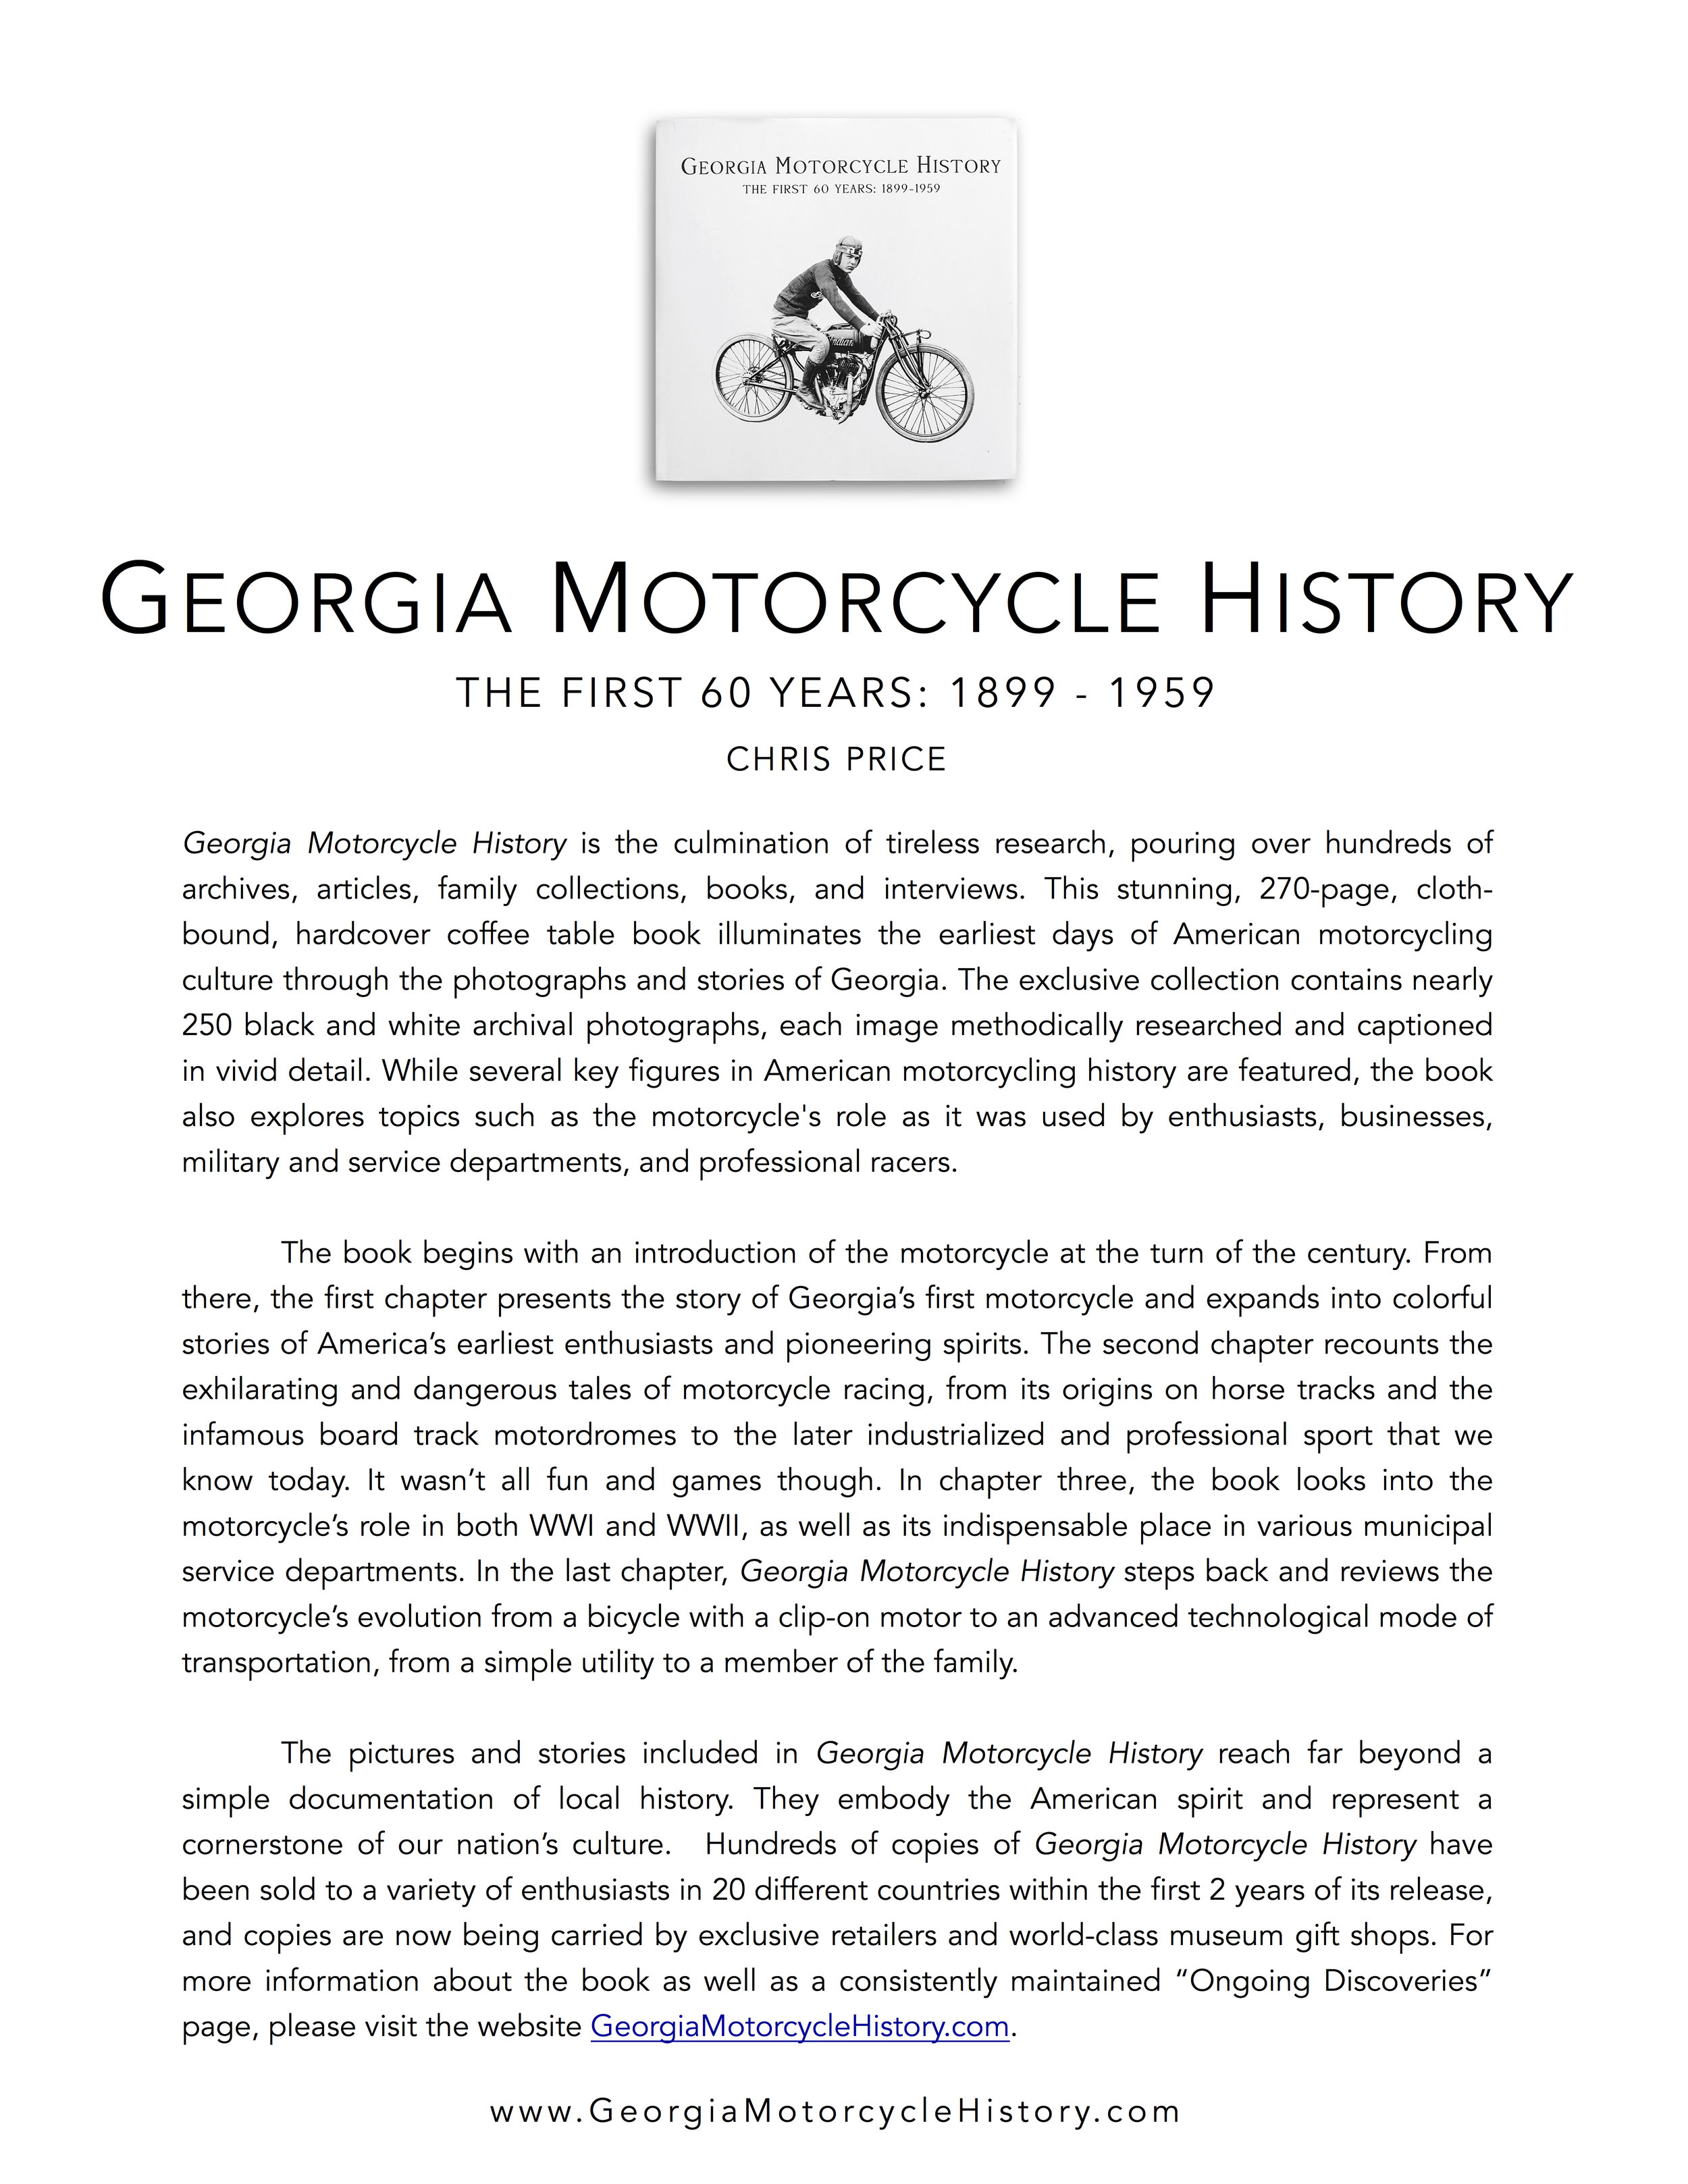 GMH Press Release p1.jpg